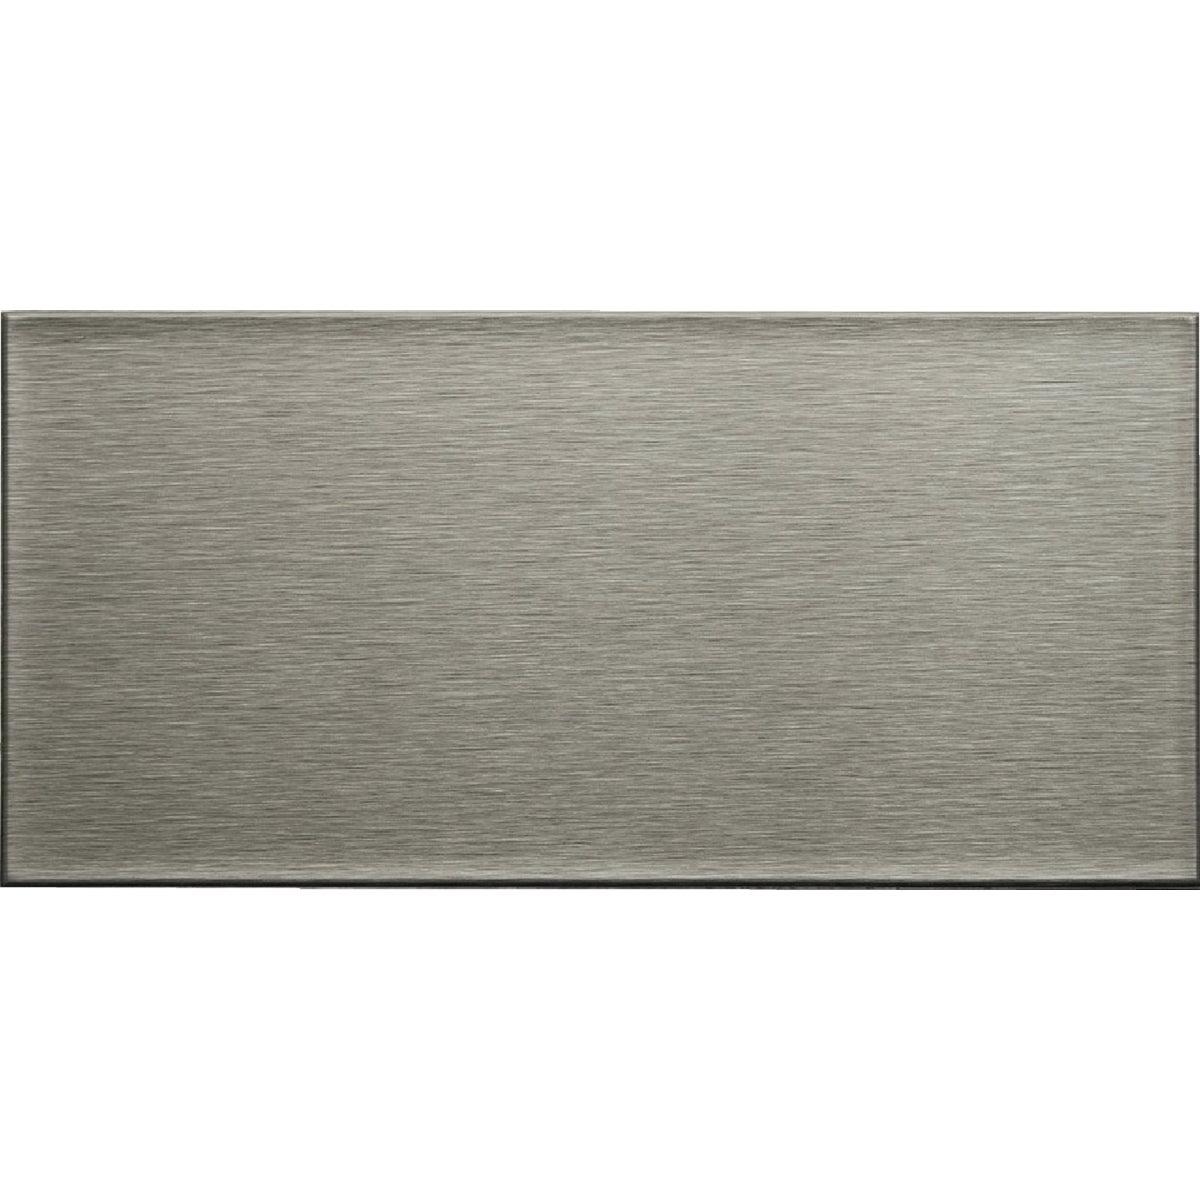 S STEEL LONG WALL TILE - A52-50 by Acp